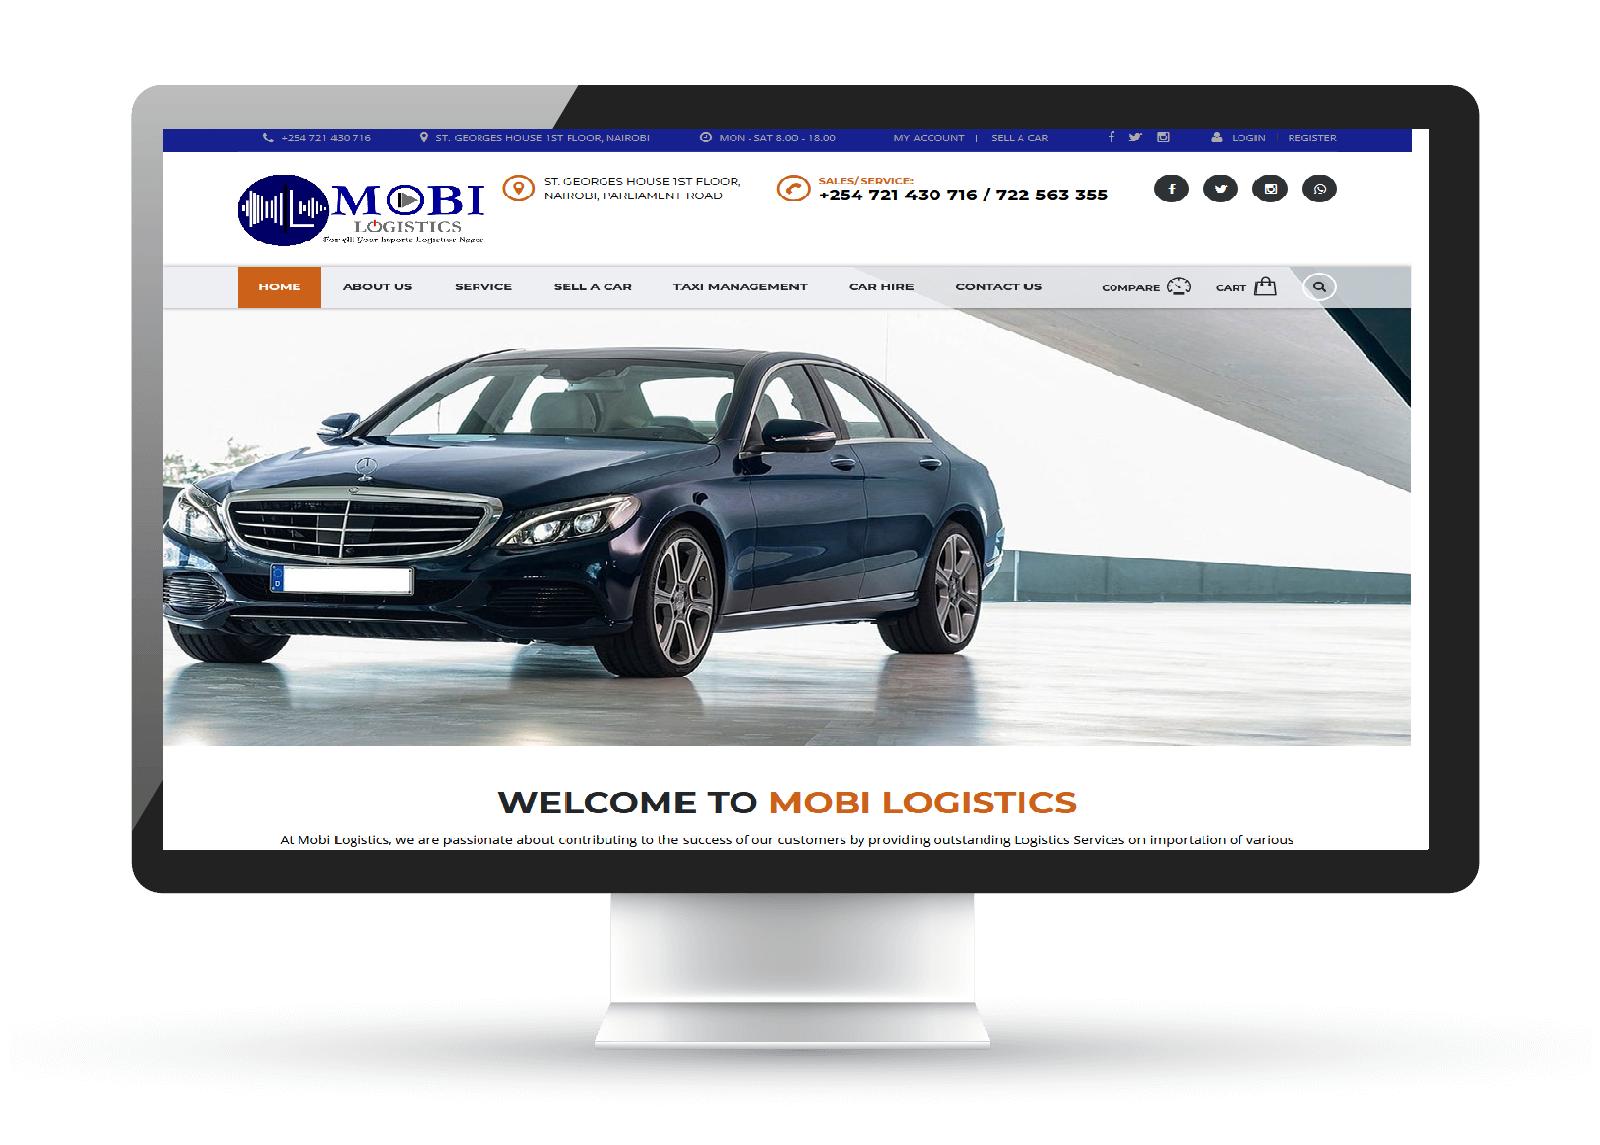 Mobi Logistics